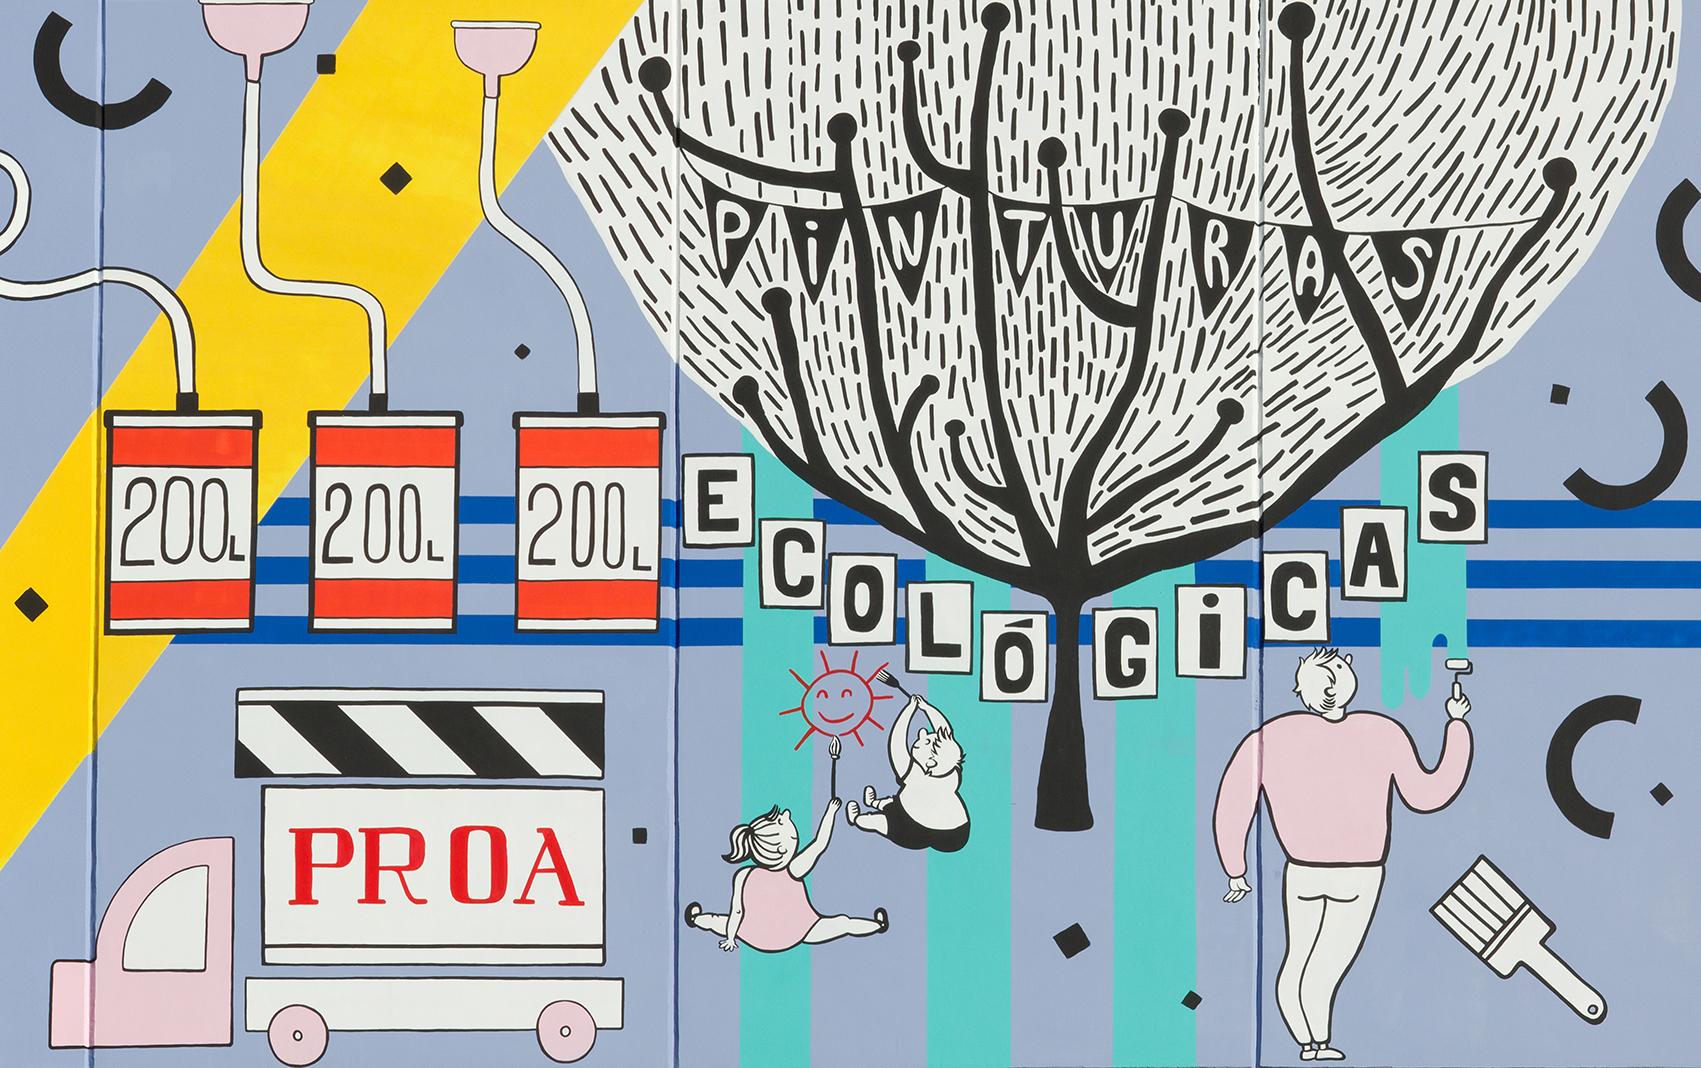 mural juxtapoz itsnicethat creativereview graffiti arte urbano muralismo